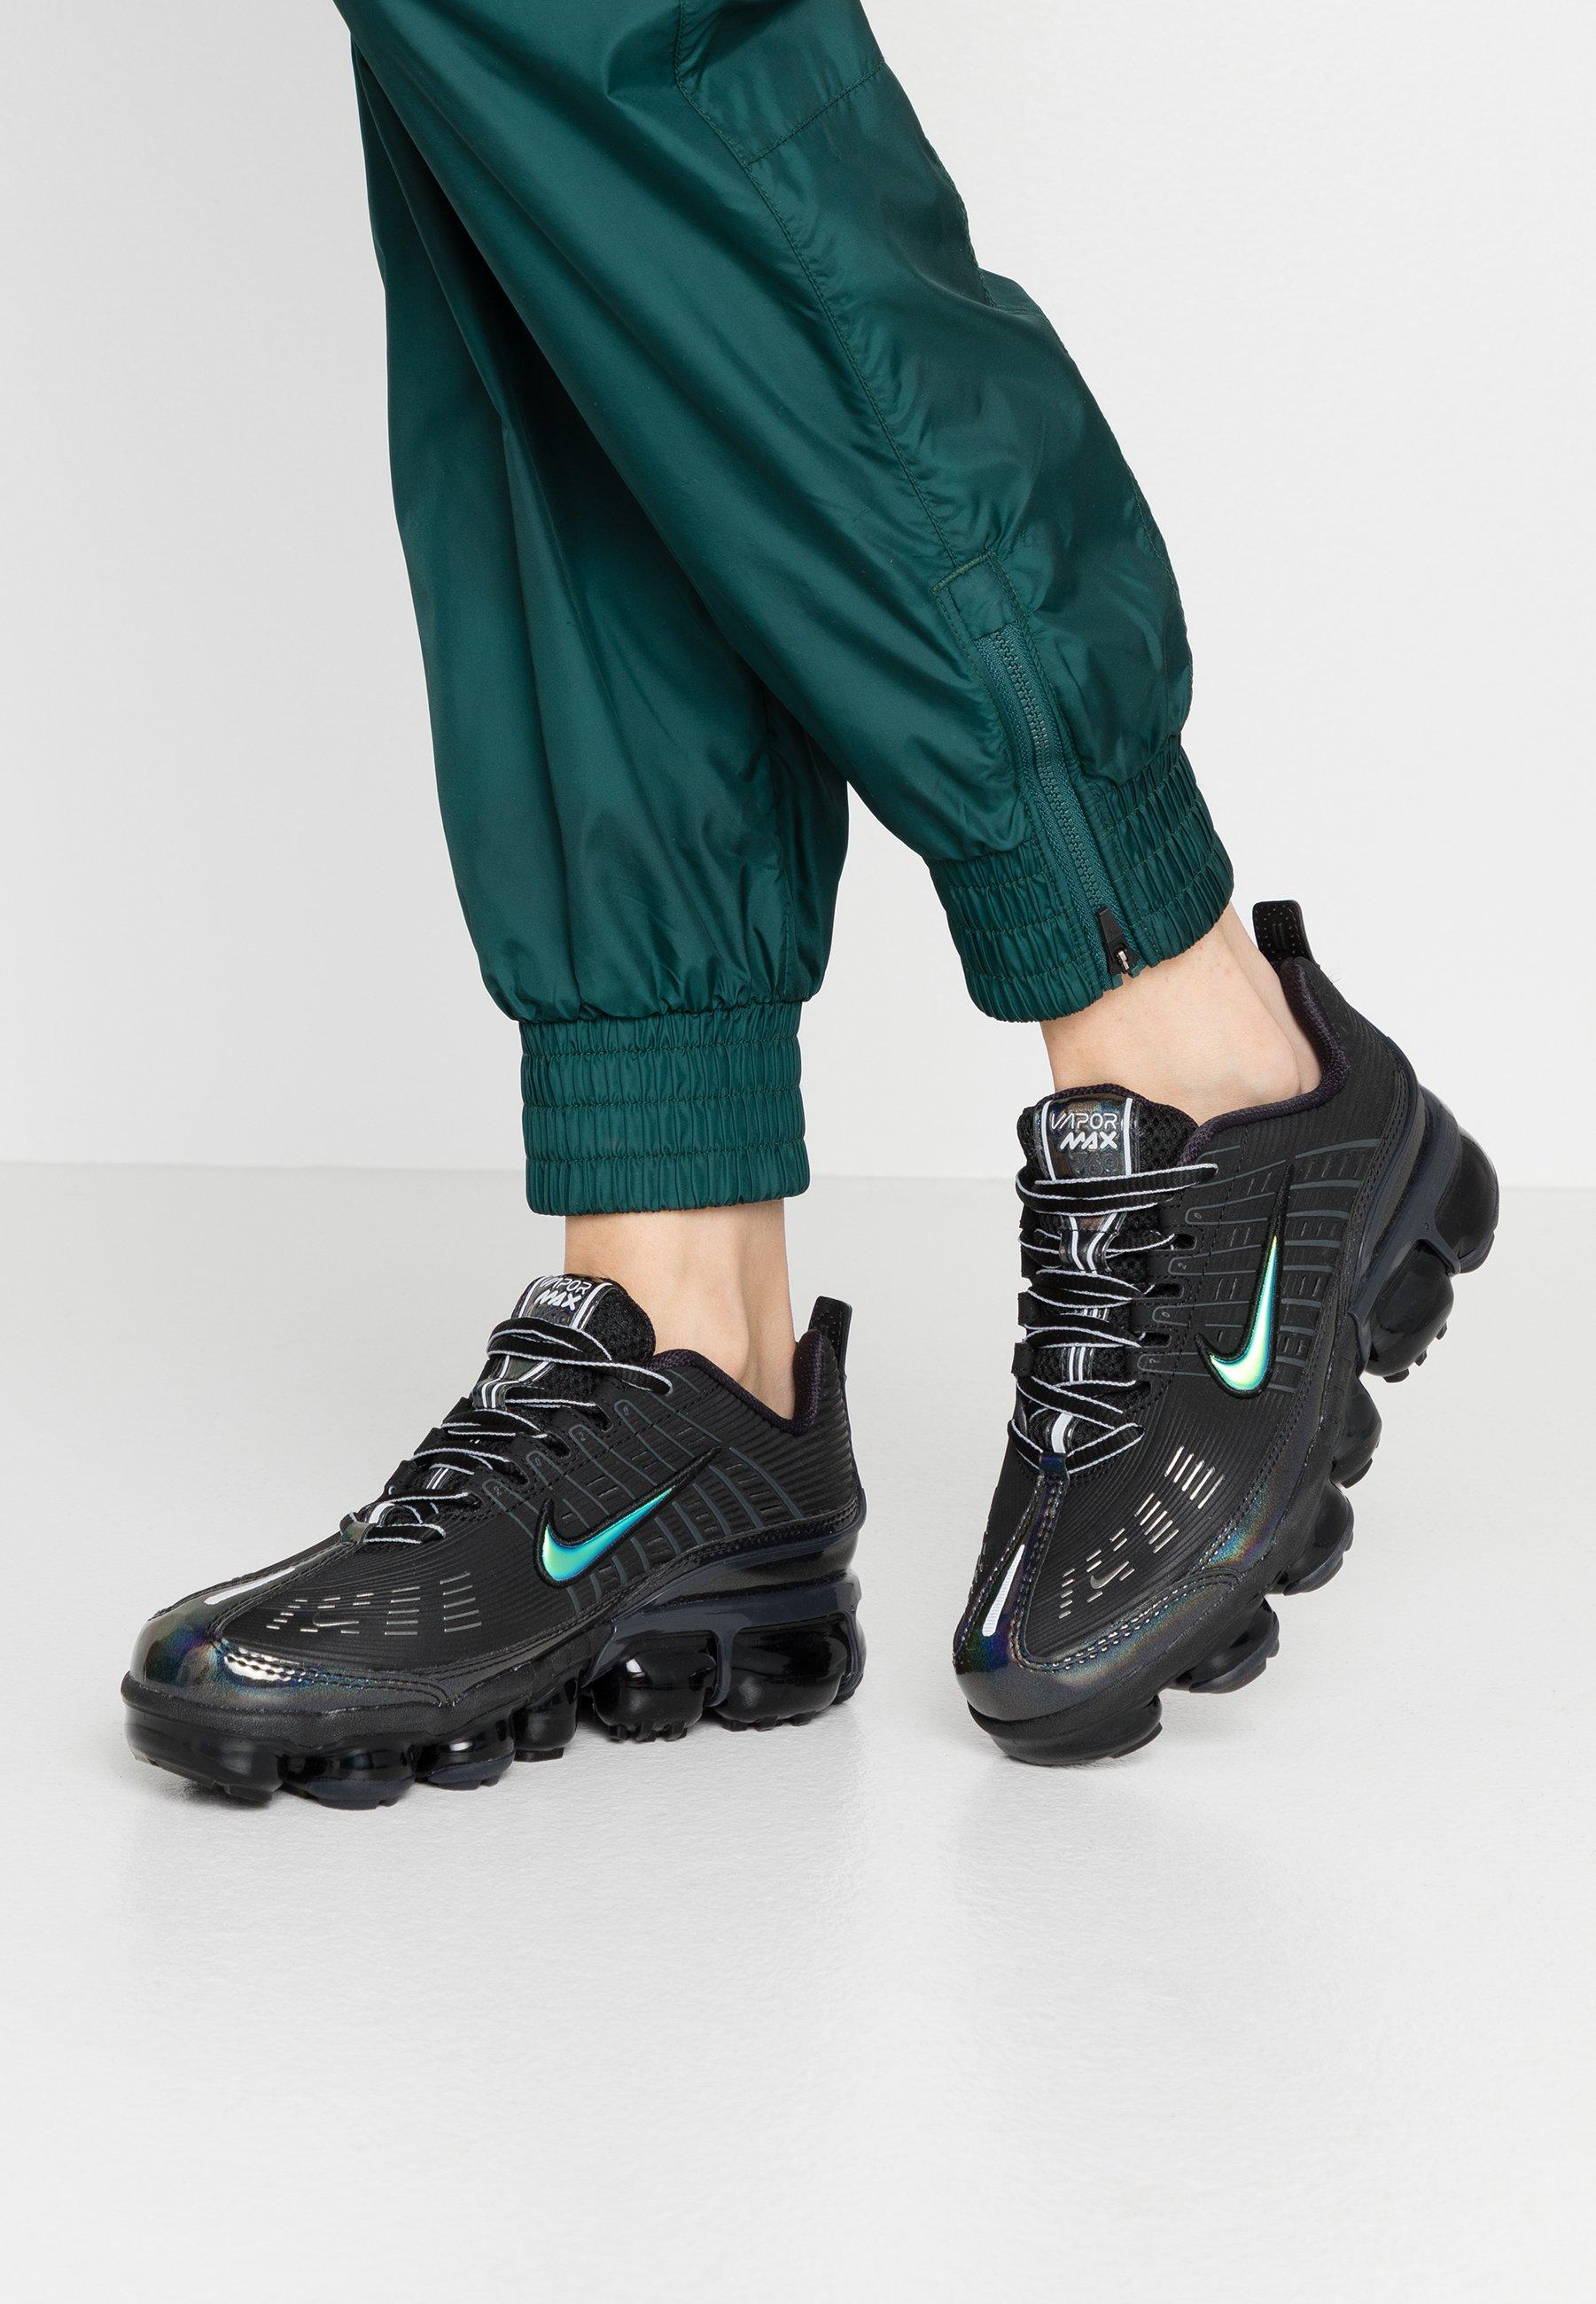 Sandalias Juramento Glamour  Nike Sportswear NIKE AIR VAPORMAX 360 - Zapatillas -  black/anthracite/metallic dark grey/negro - Zalando.es